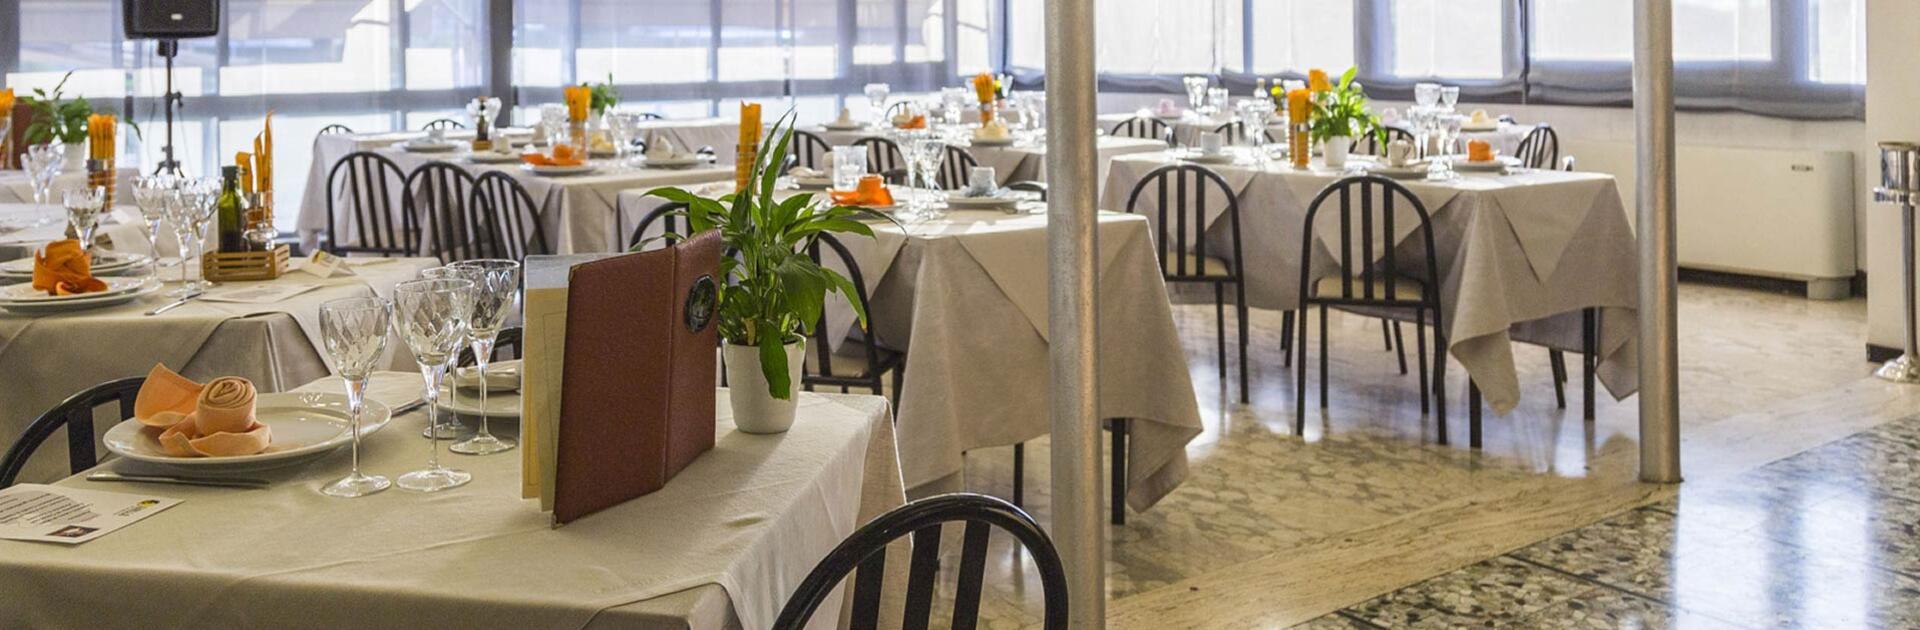 hotelbixio it cucina 009